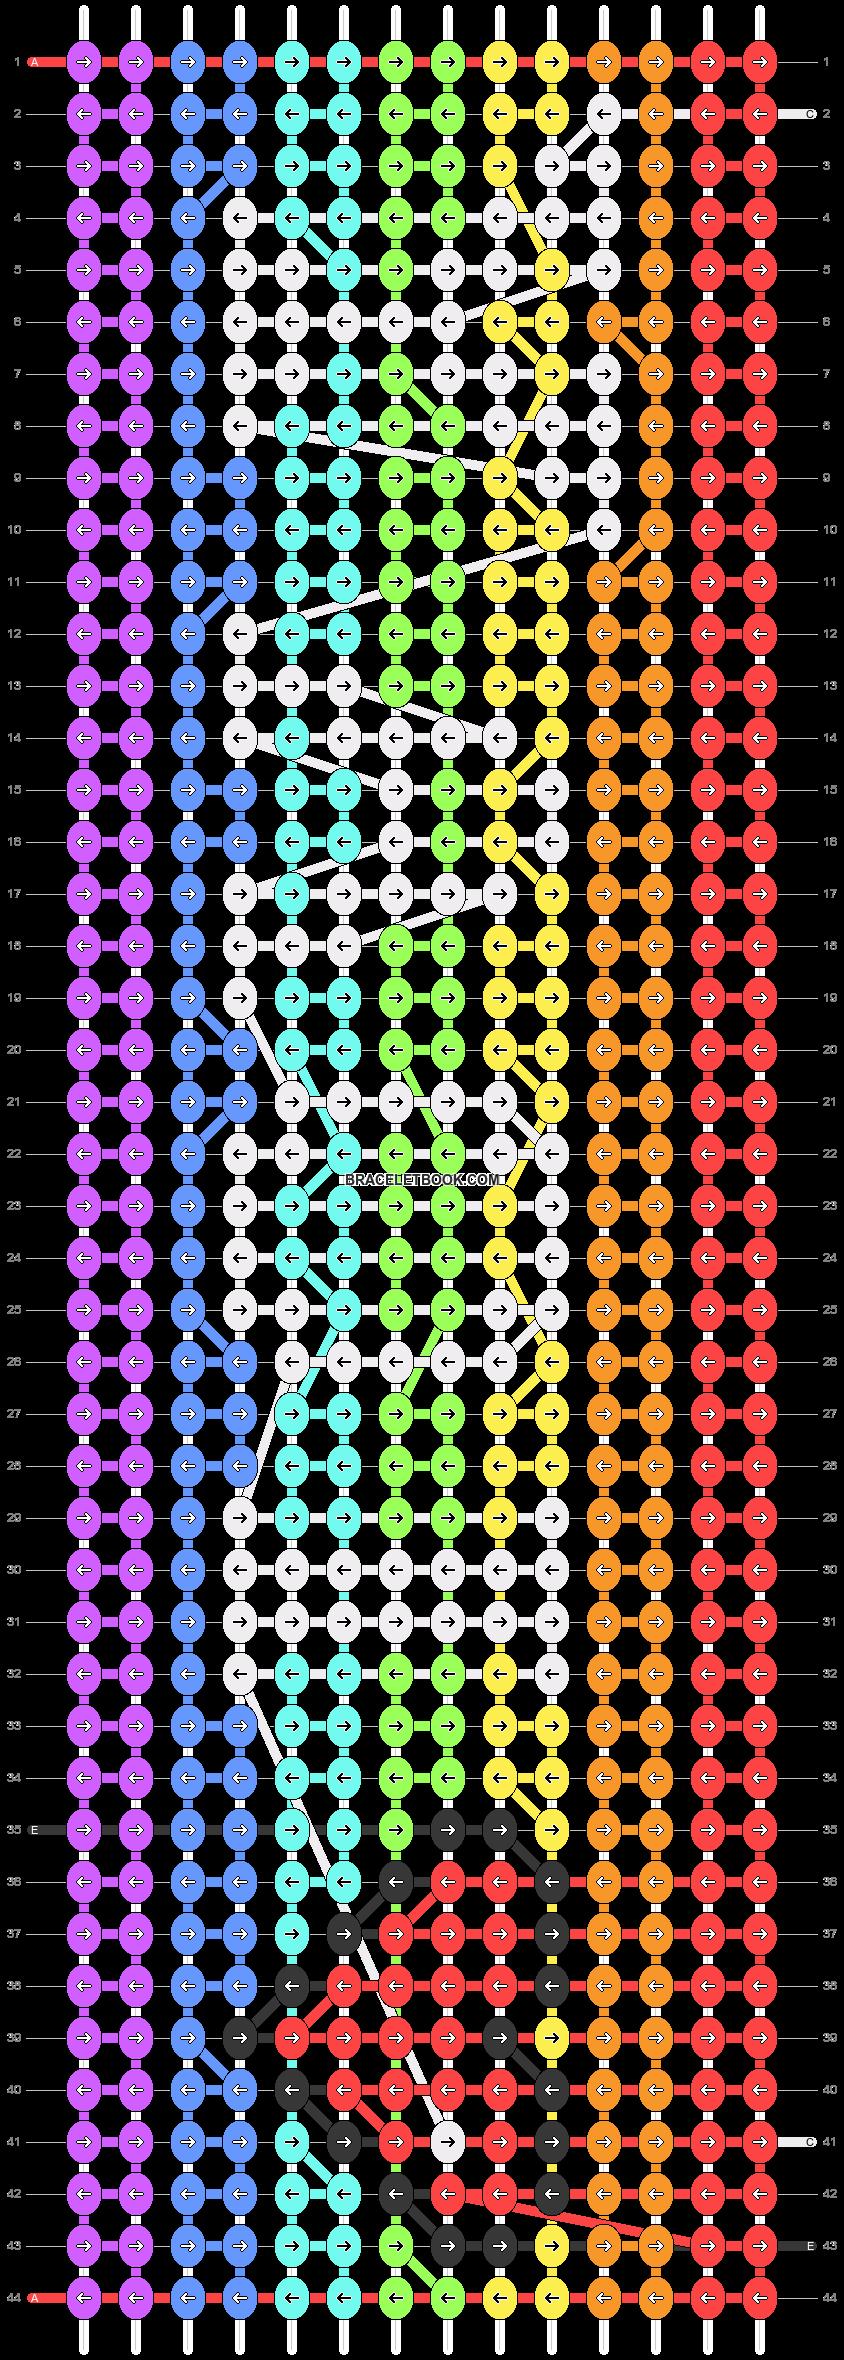 Alpha Pattern #22124 added by Armany